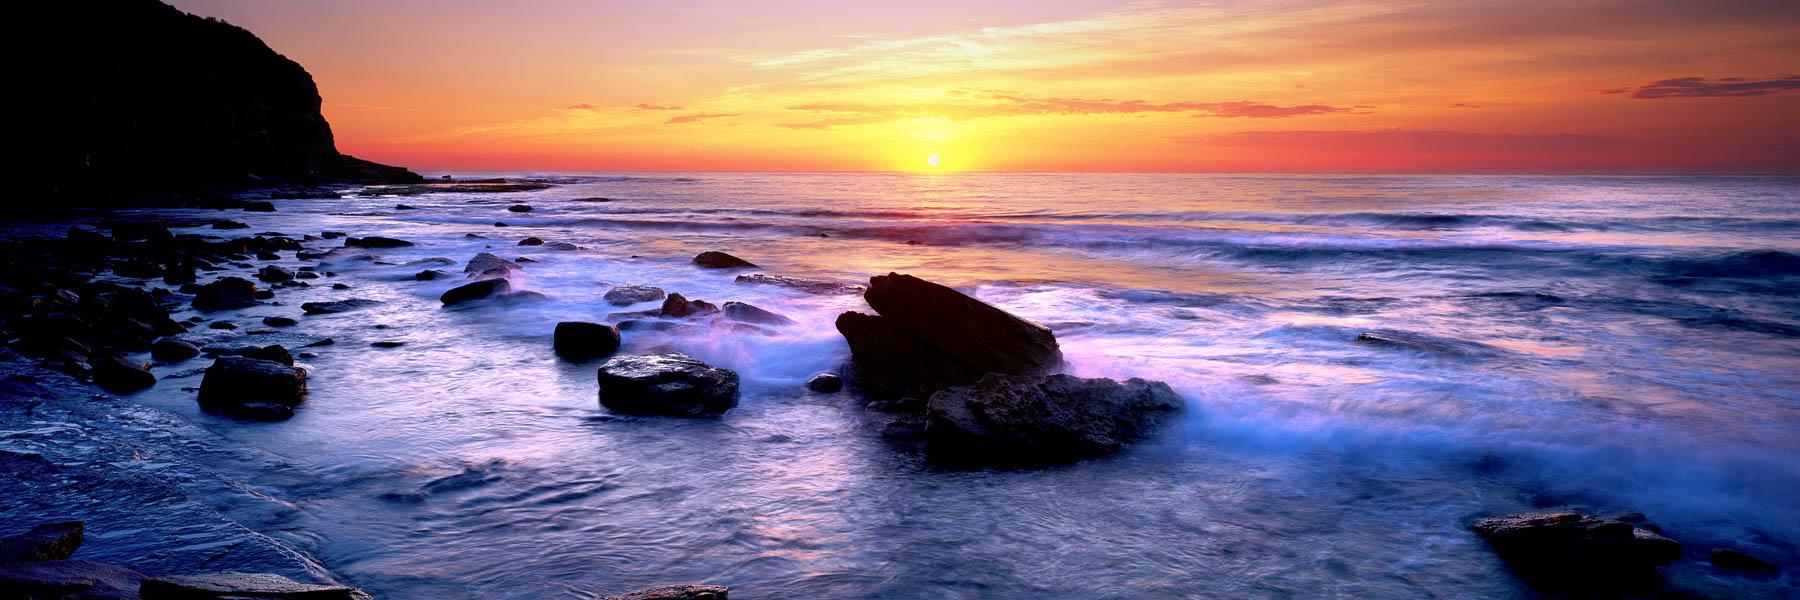 A golden sunrise over Turimetta Beach, NSW, Australia.